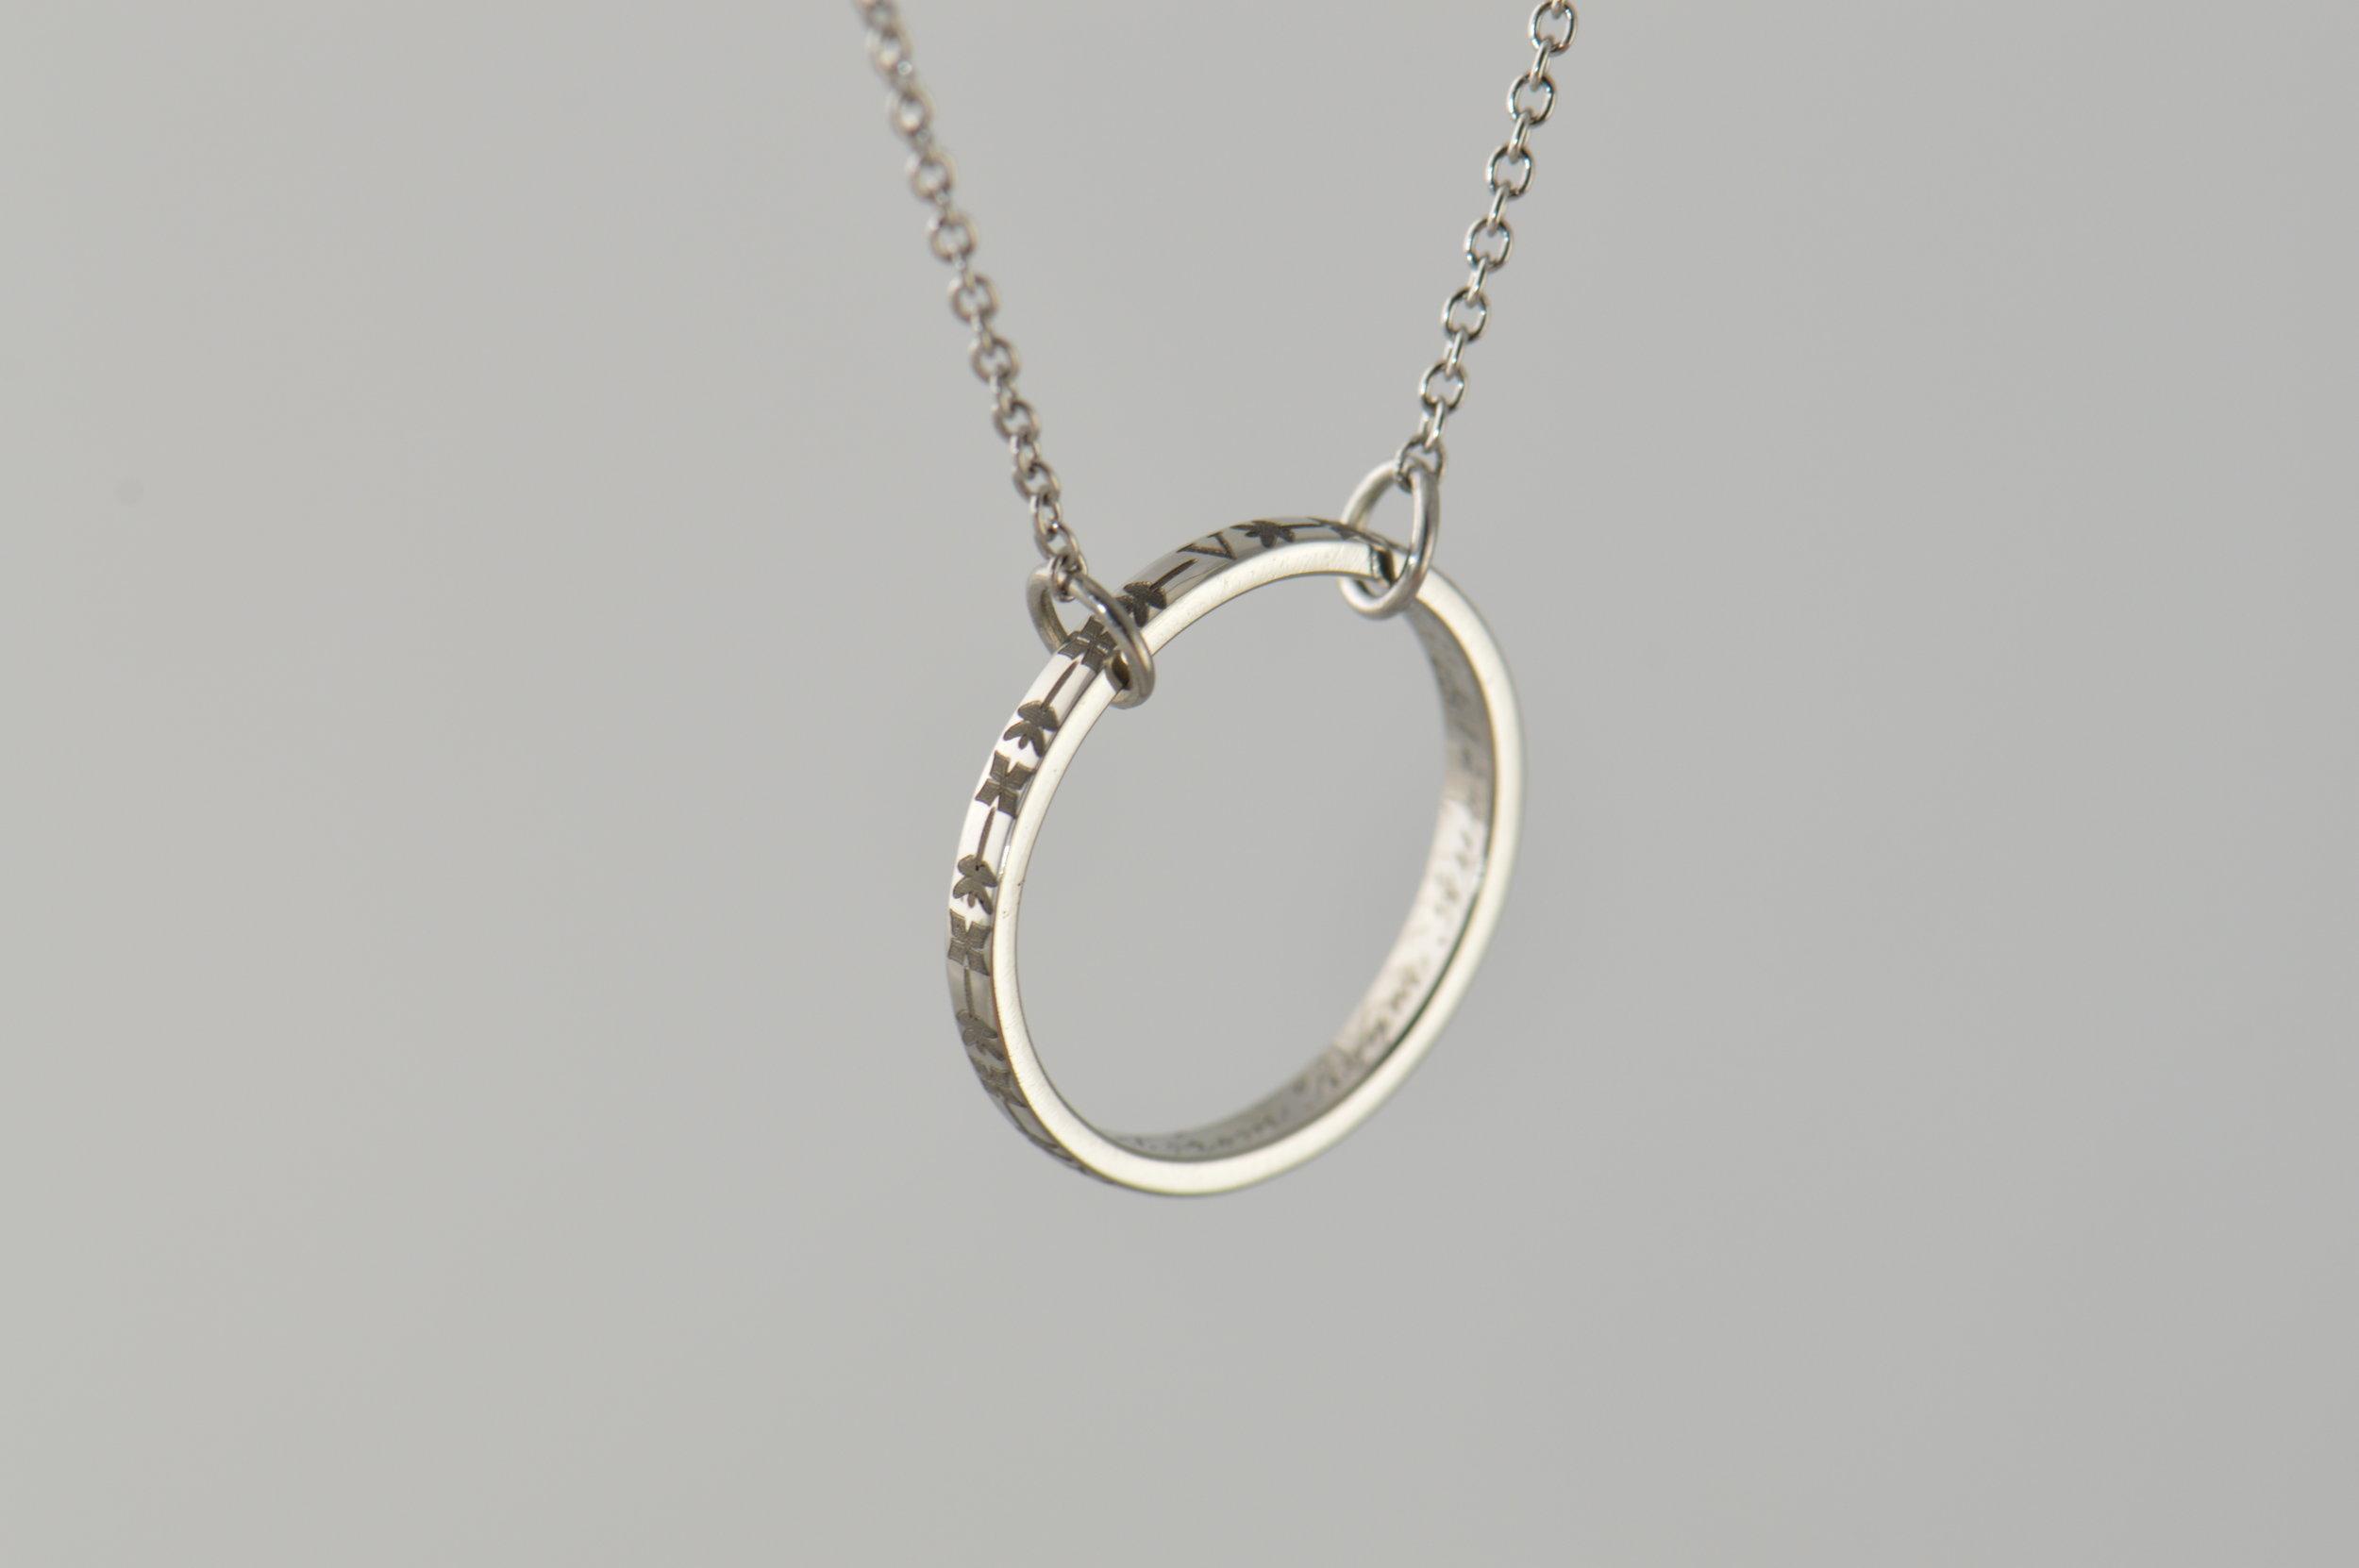 darvier-vintage-heirloom-engraved-necklace-conversion.JPG